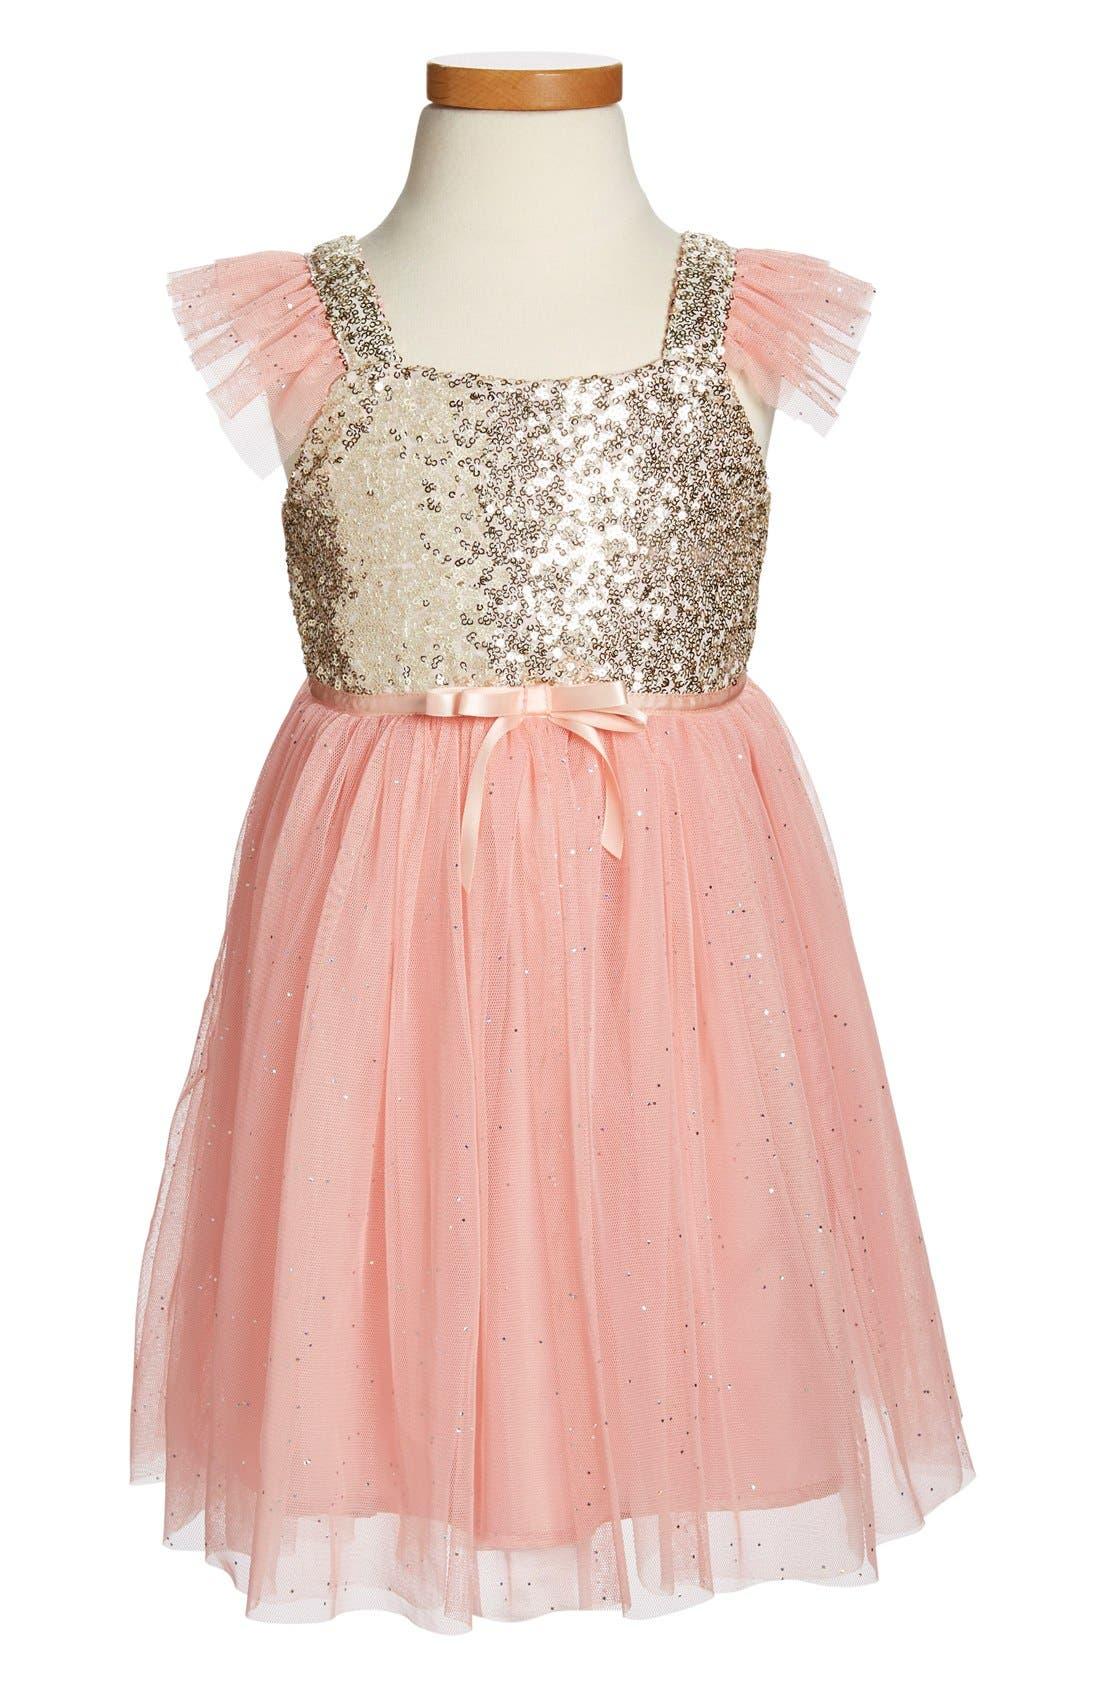 POPATU, Sequin Bodice Tulle Dress, Main thumbnail 1, color, PEACH